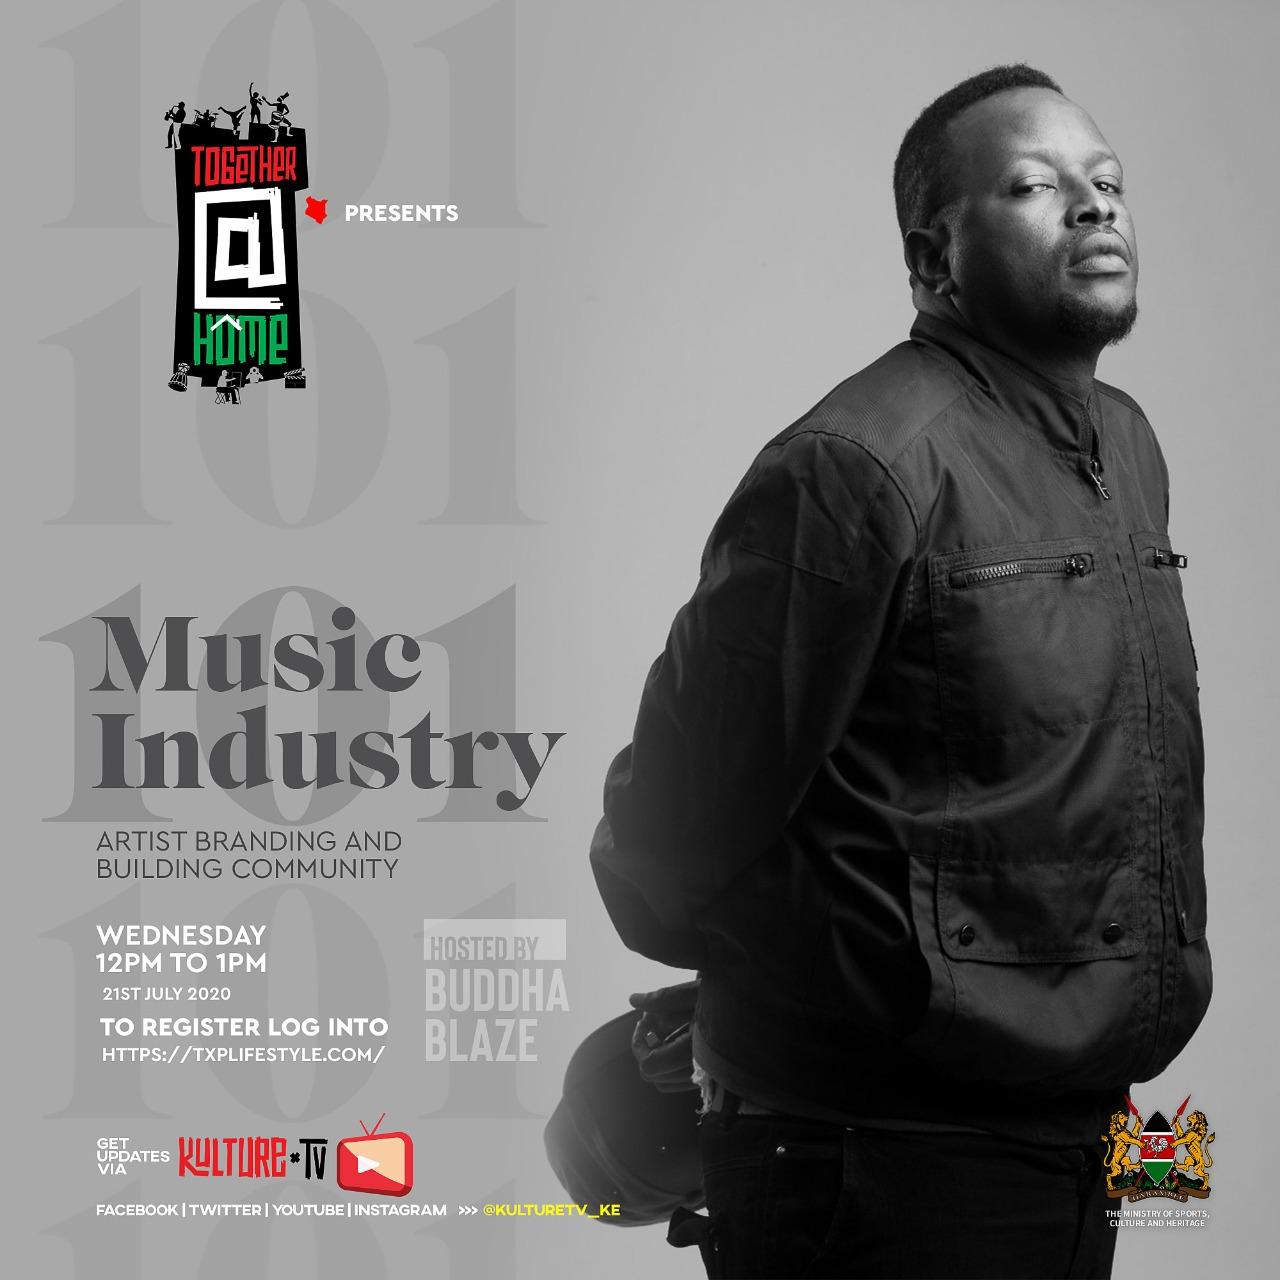 Music Industry 101 - Artist branding & building community